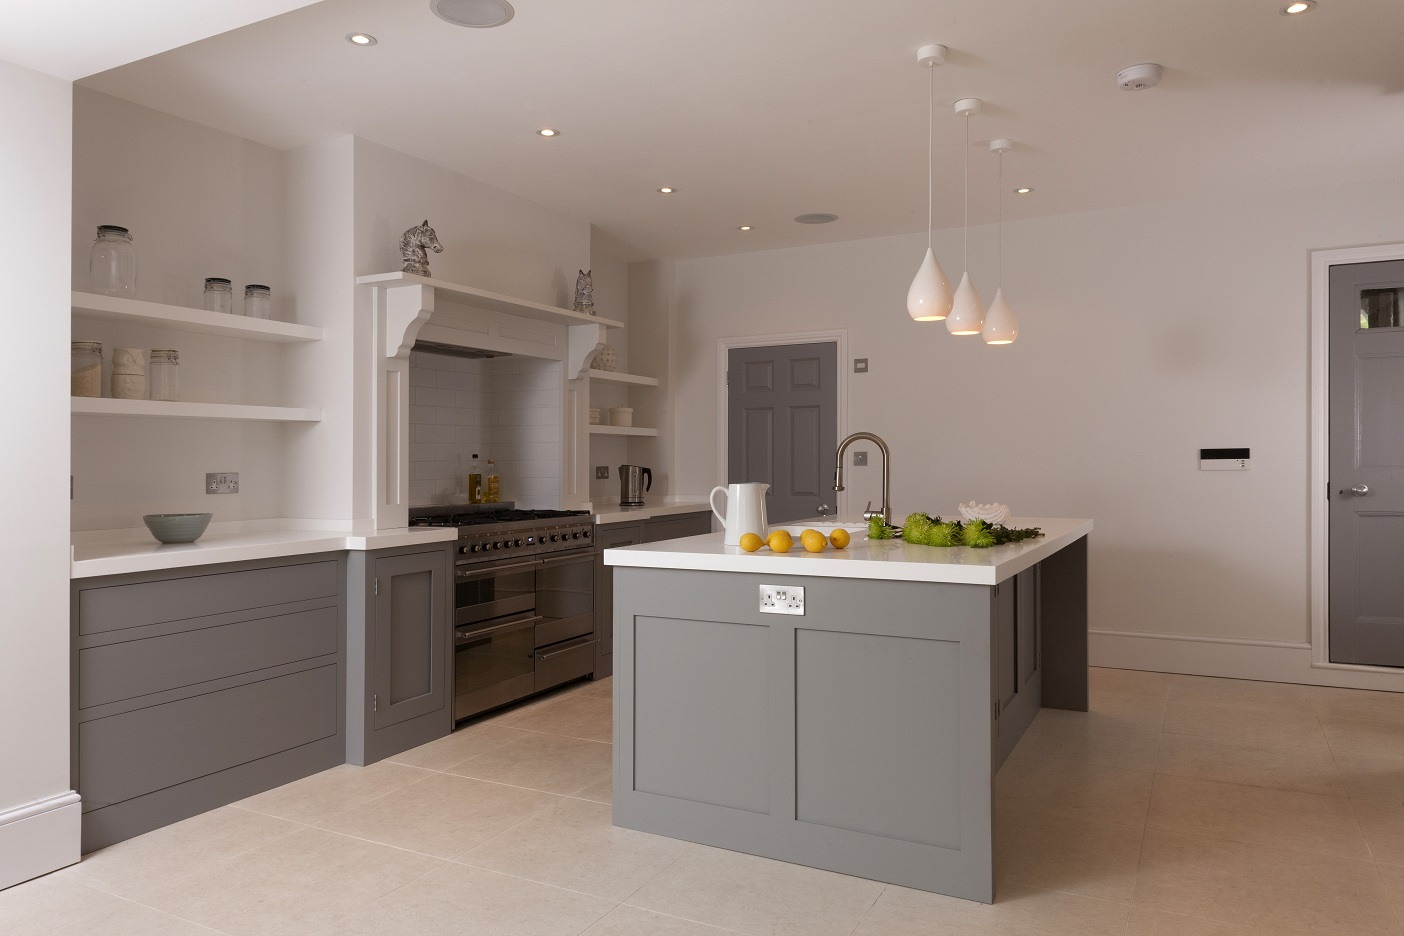 Handleless Shaker in Beautiful Kitchens